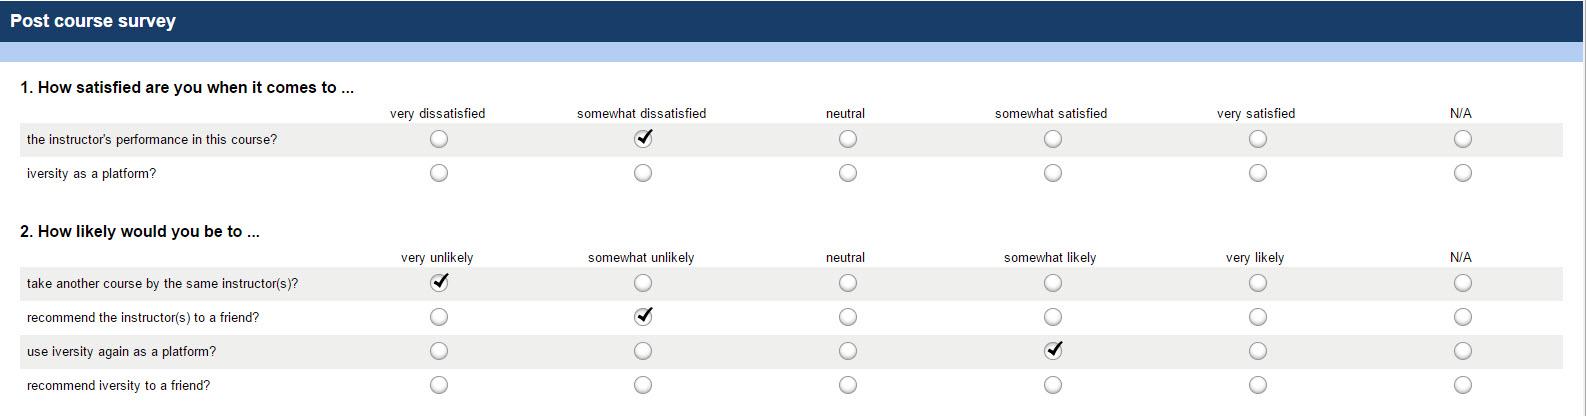 How Do I Design A User Friendly Survey With More Than 150